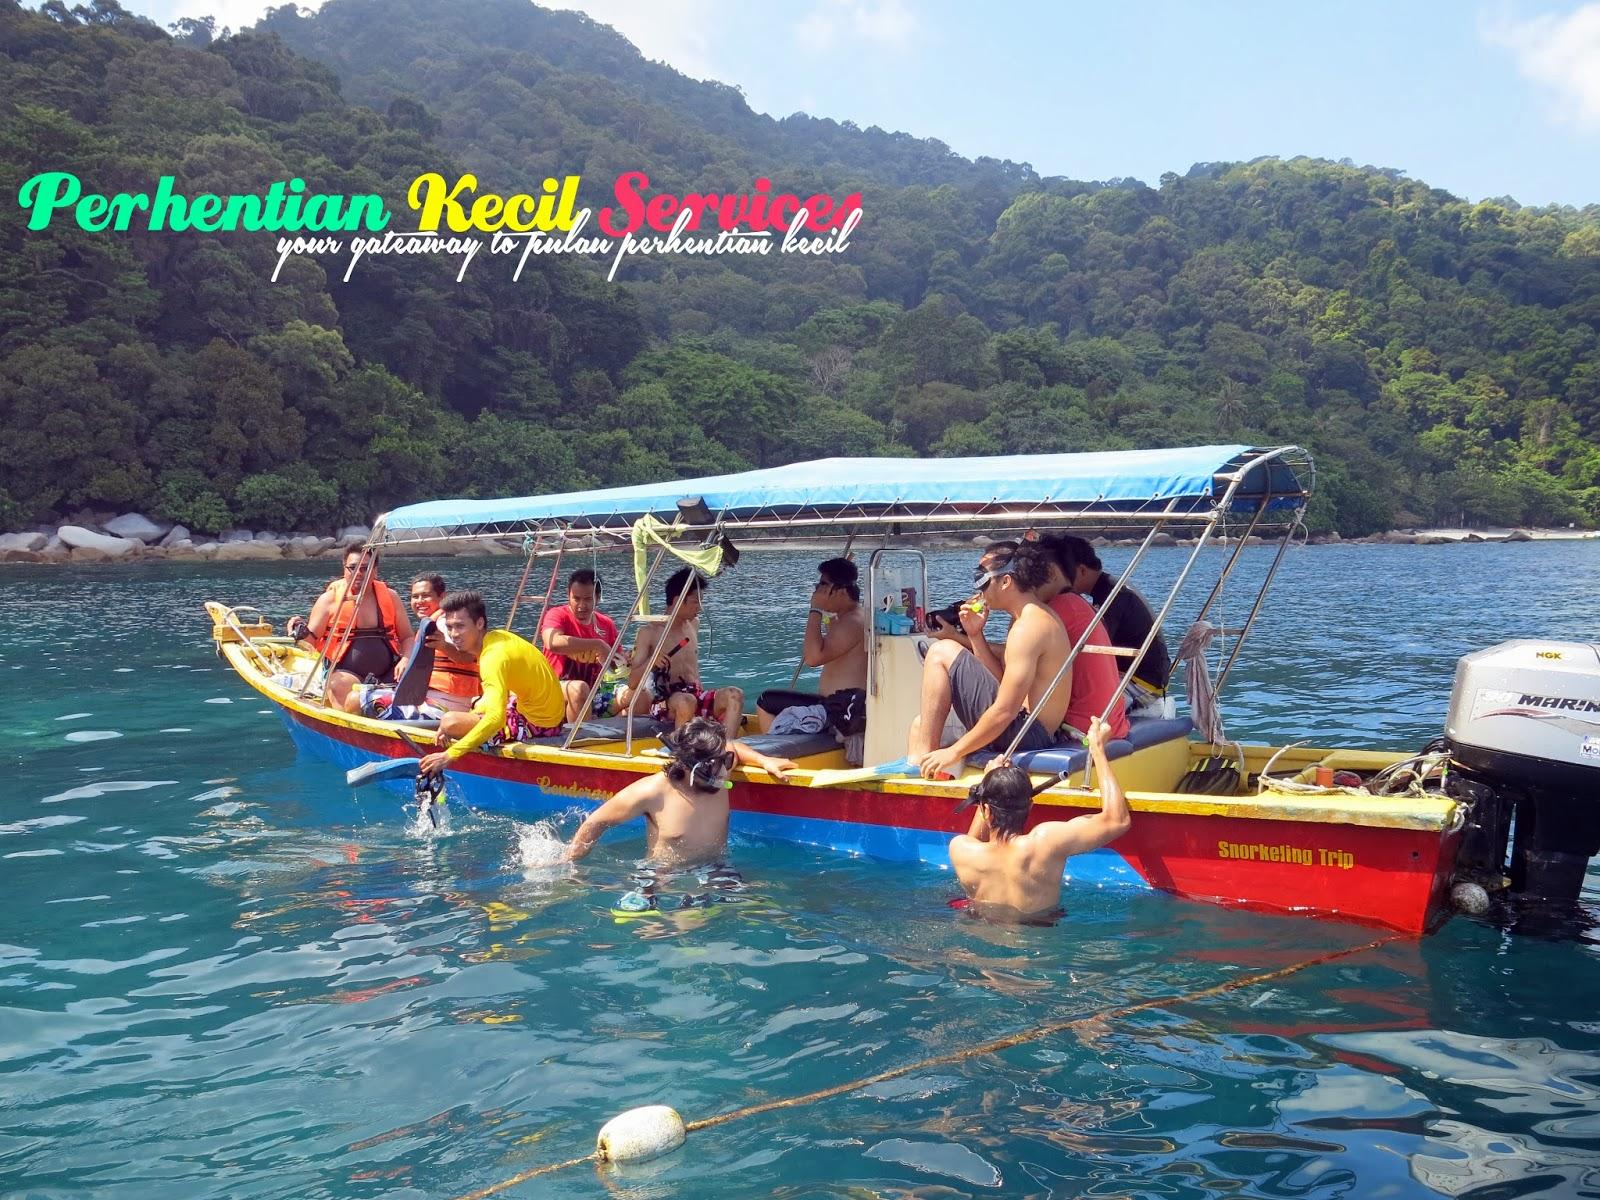 pakej snorkeling pulau perhentian, pakej bajet pulau perhentian, pakej fullboard pulau perhentian, snorkeling terbaik di pulau perhentian, perhentian kecil services